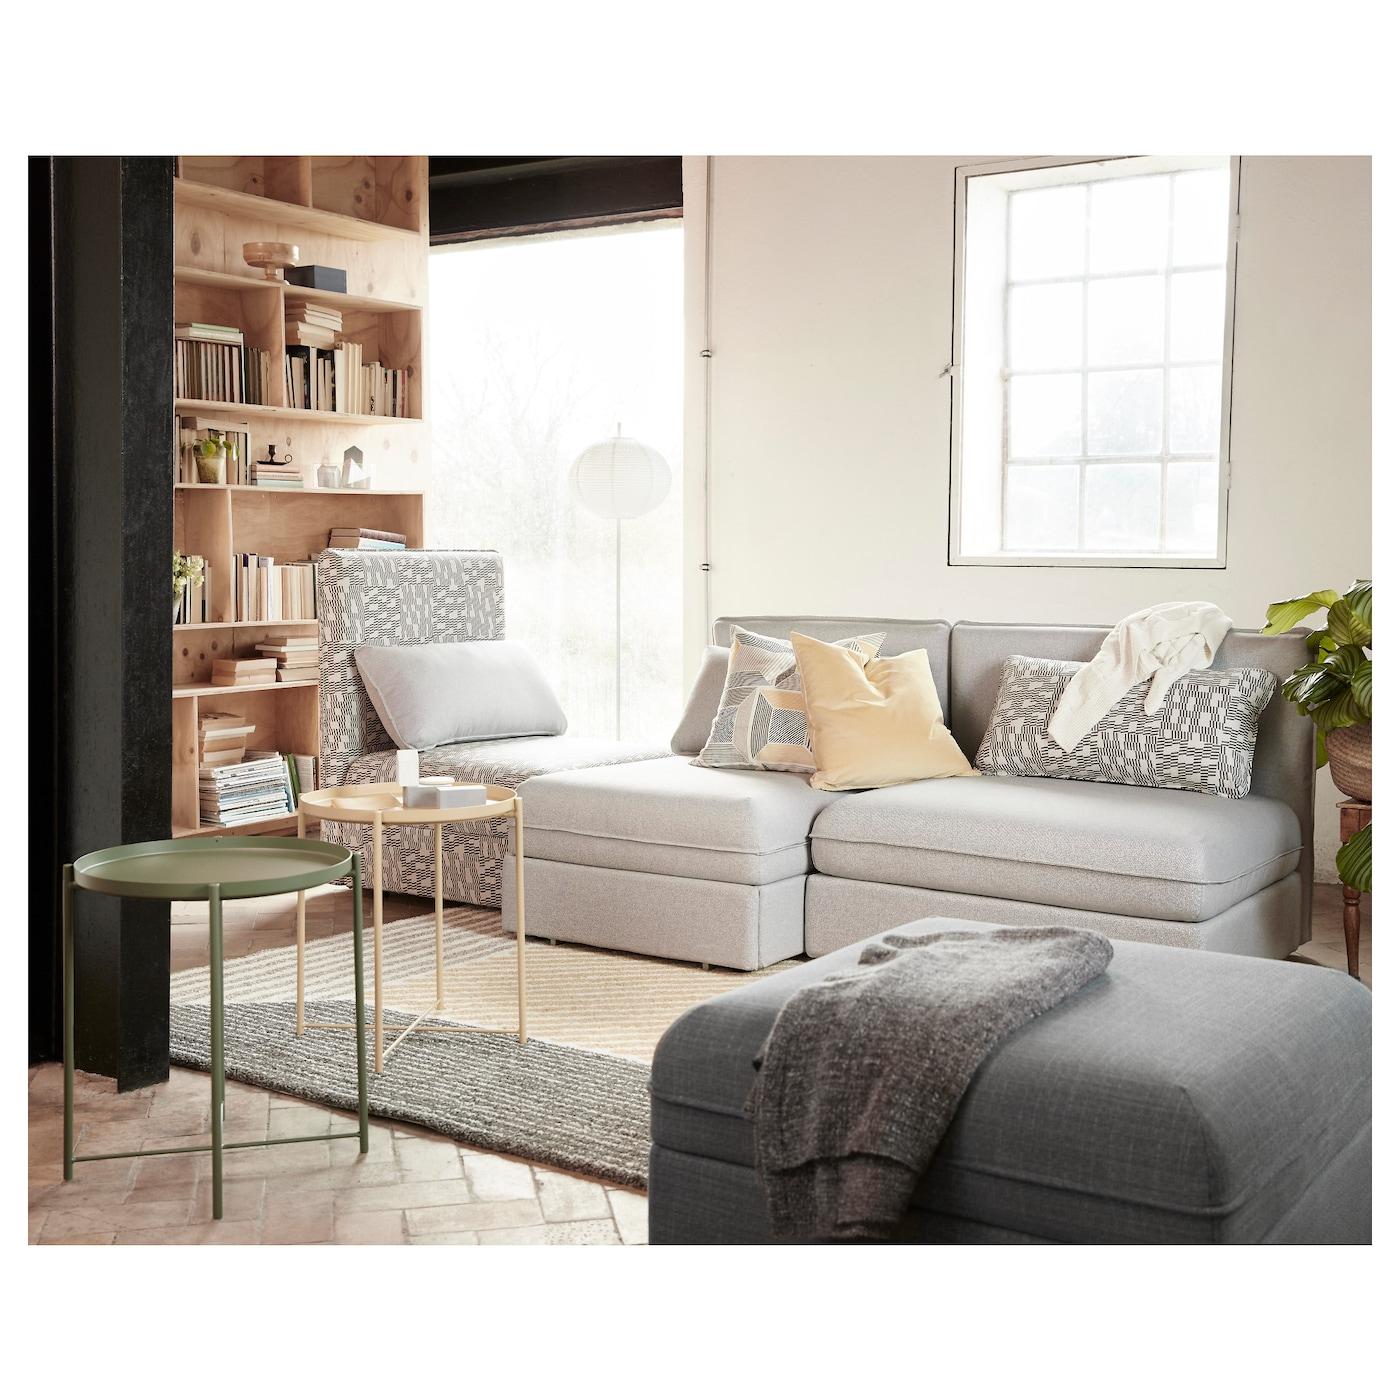 vallentuna canap 3 places orrsta gris clair funnarp noir beige ikea. Black Bedroom Furniture Sets. Home Design Ideas